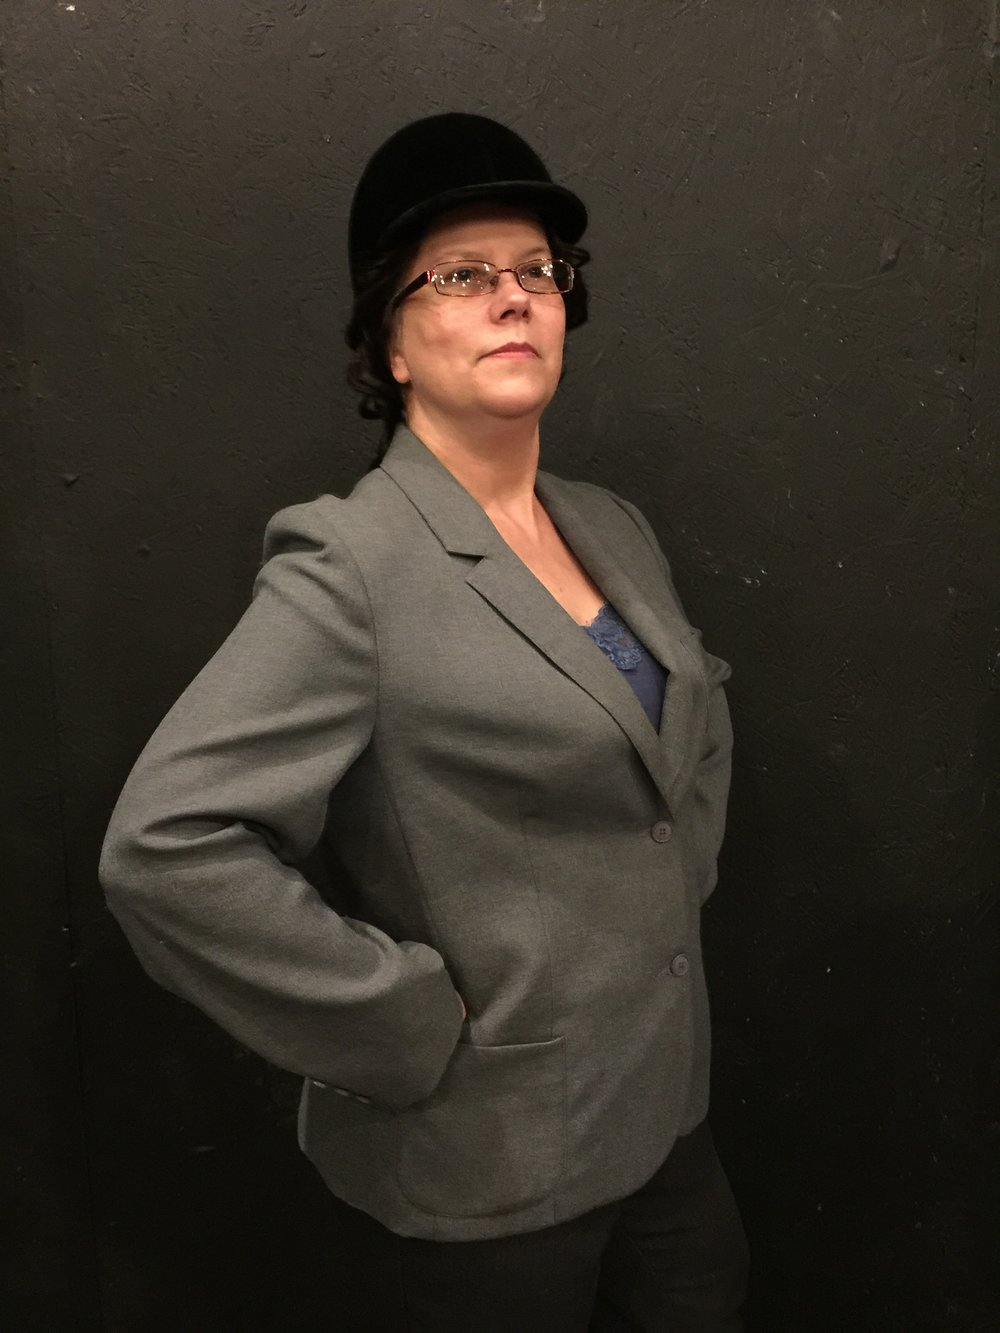 Mrs. Reece